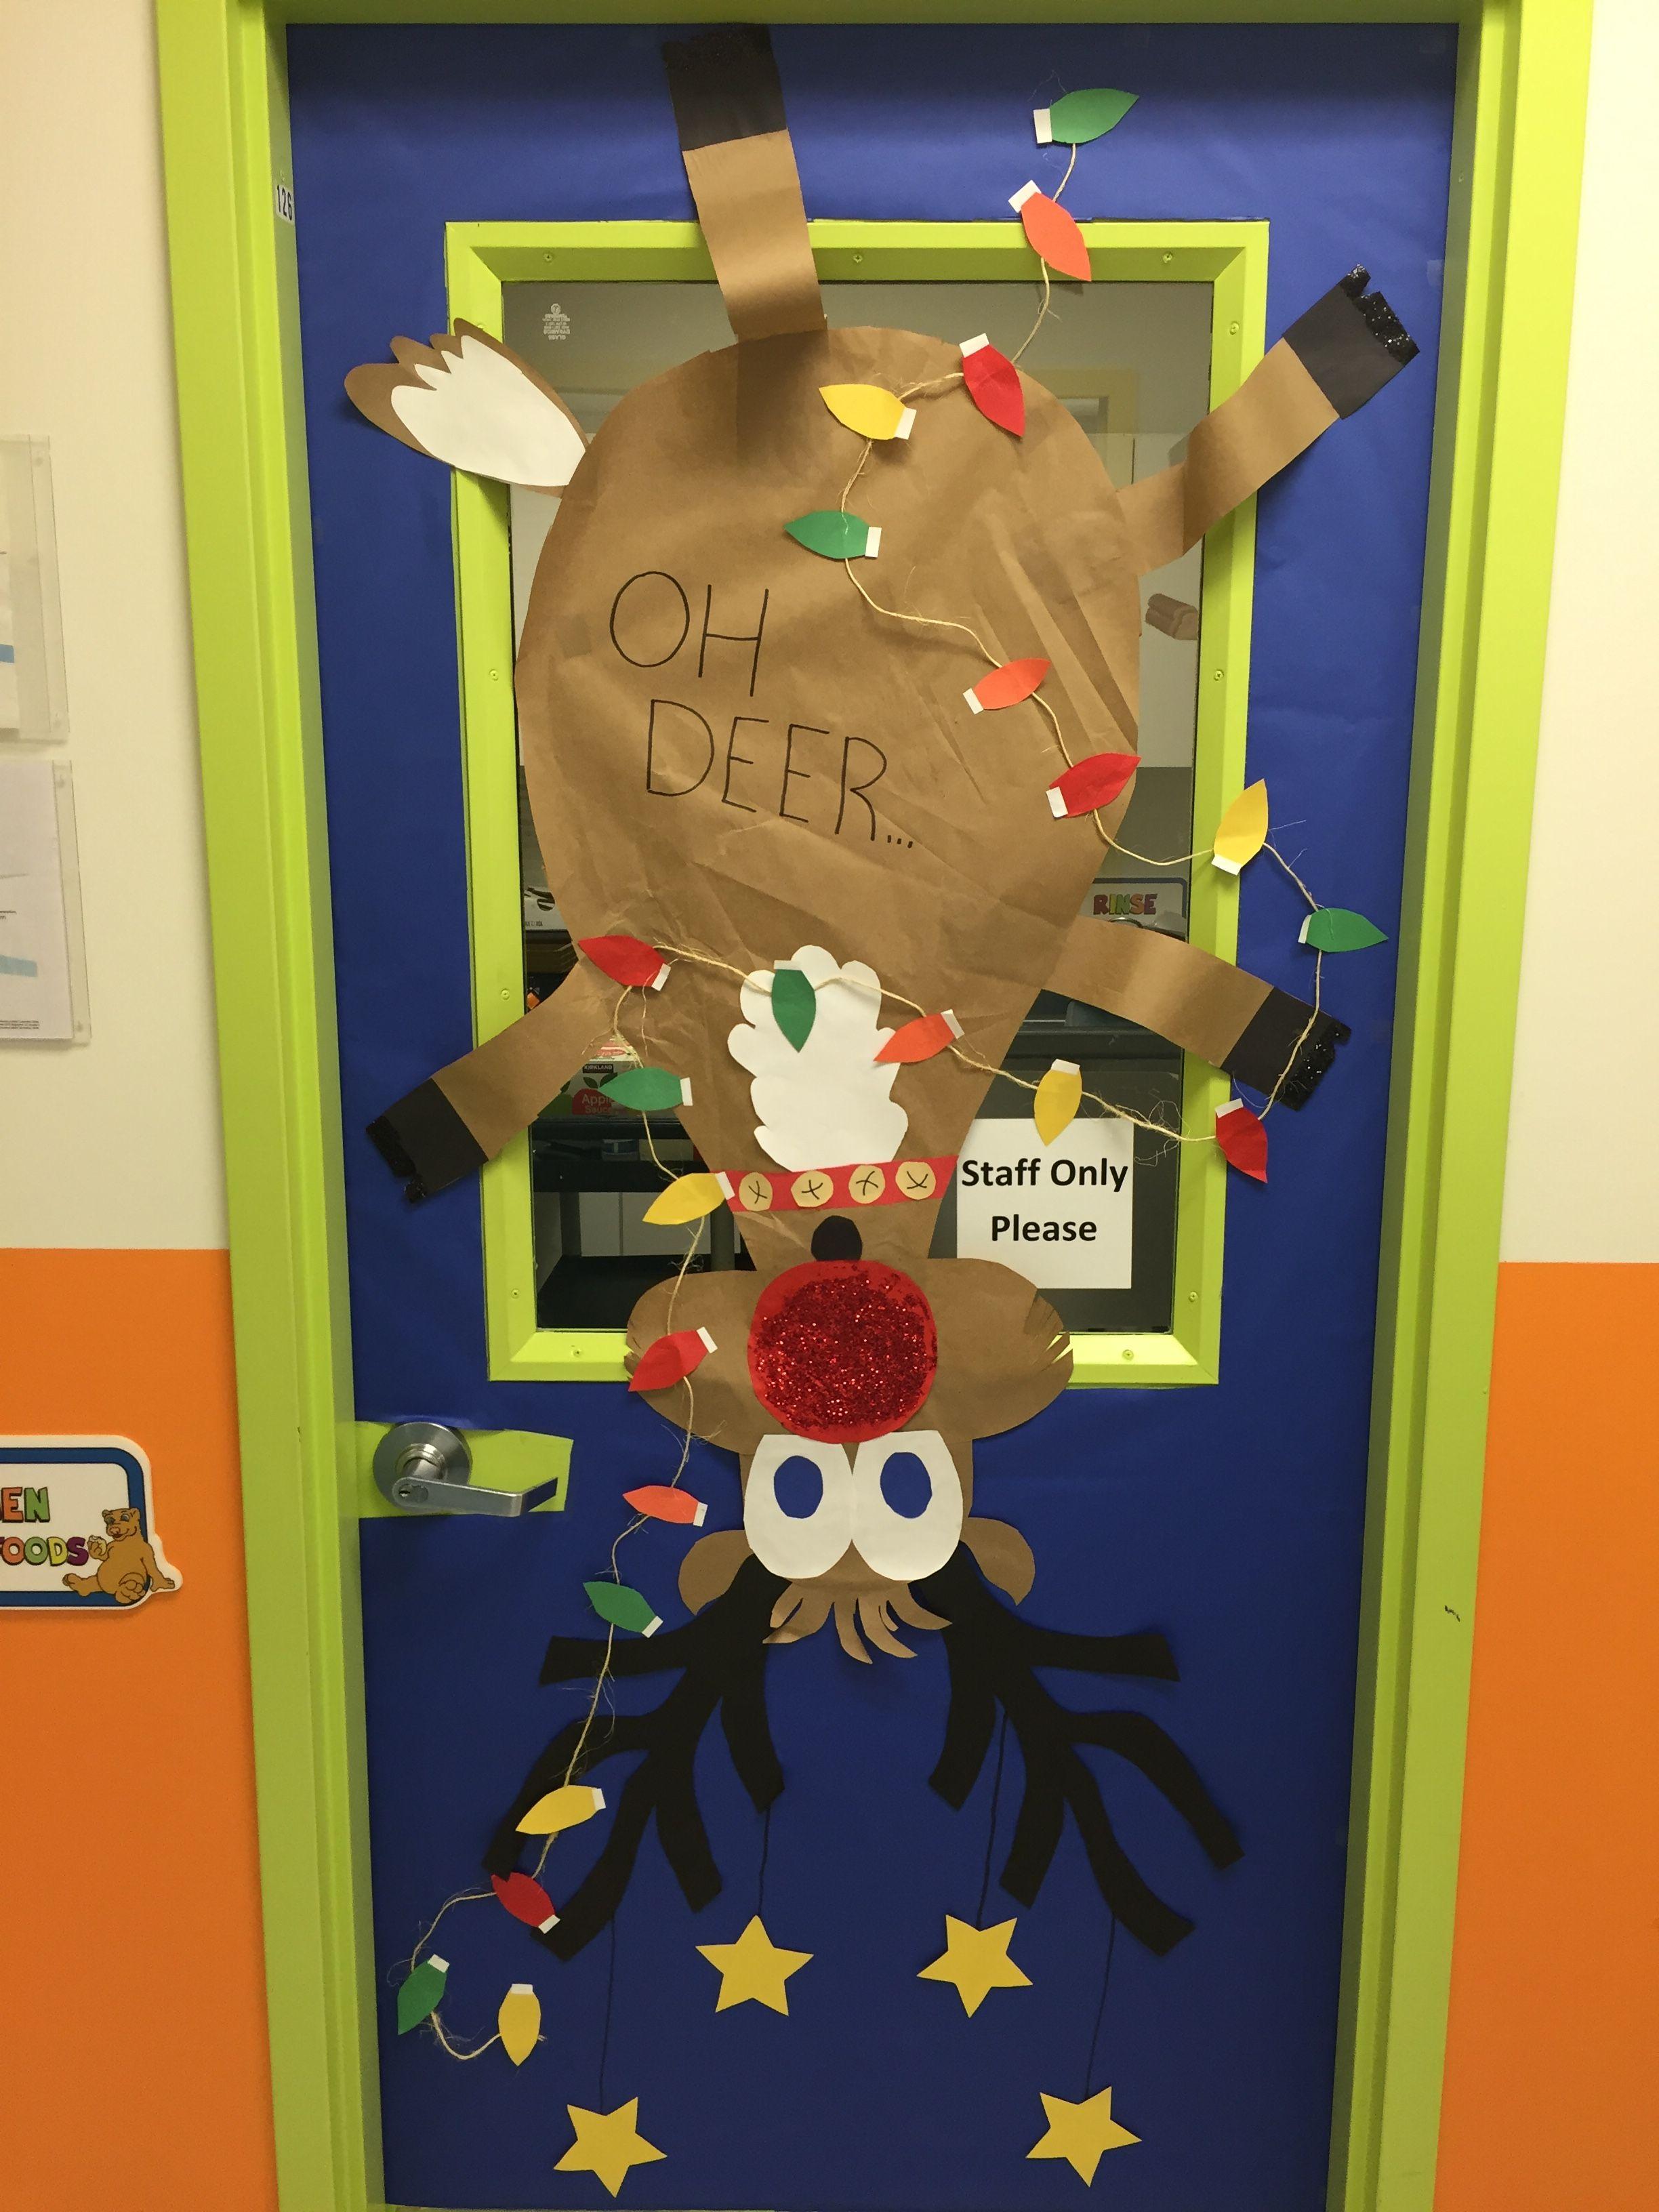 Cute Door Decoration For The Kitchen. | Creative Bulletin Board Ideas |  Pinterest